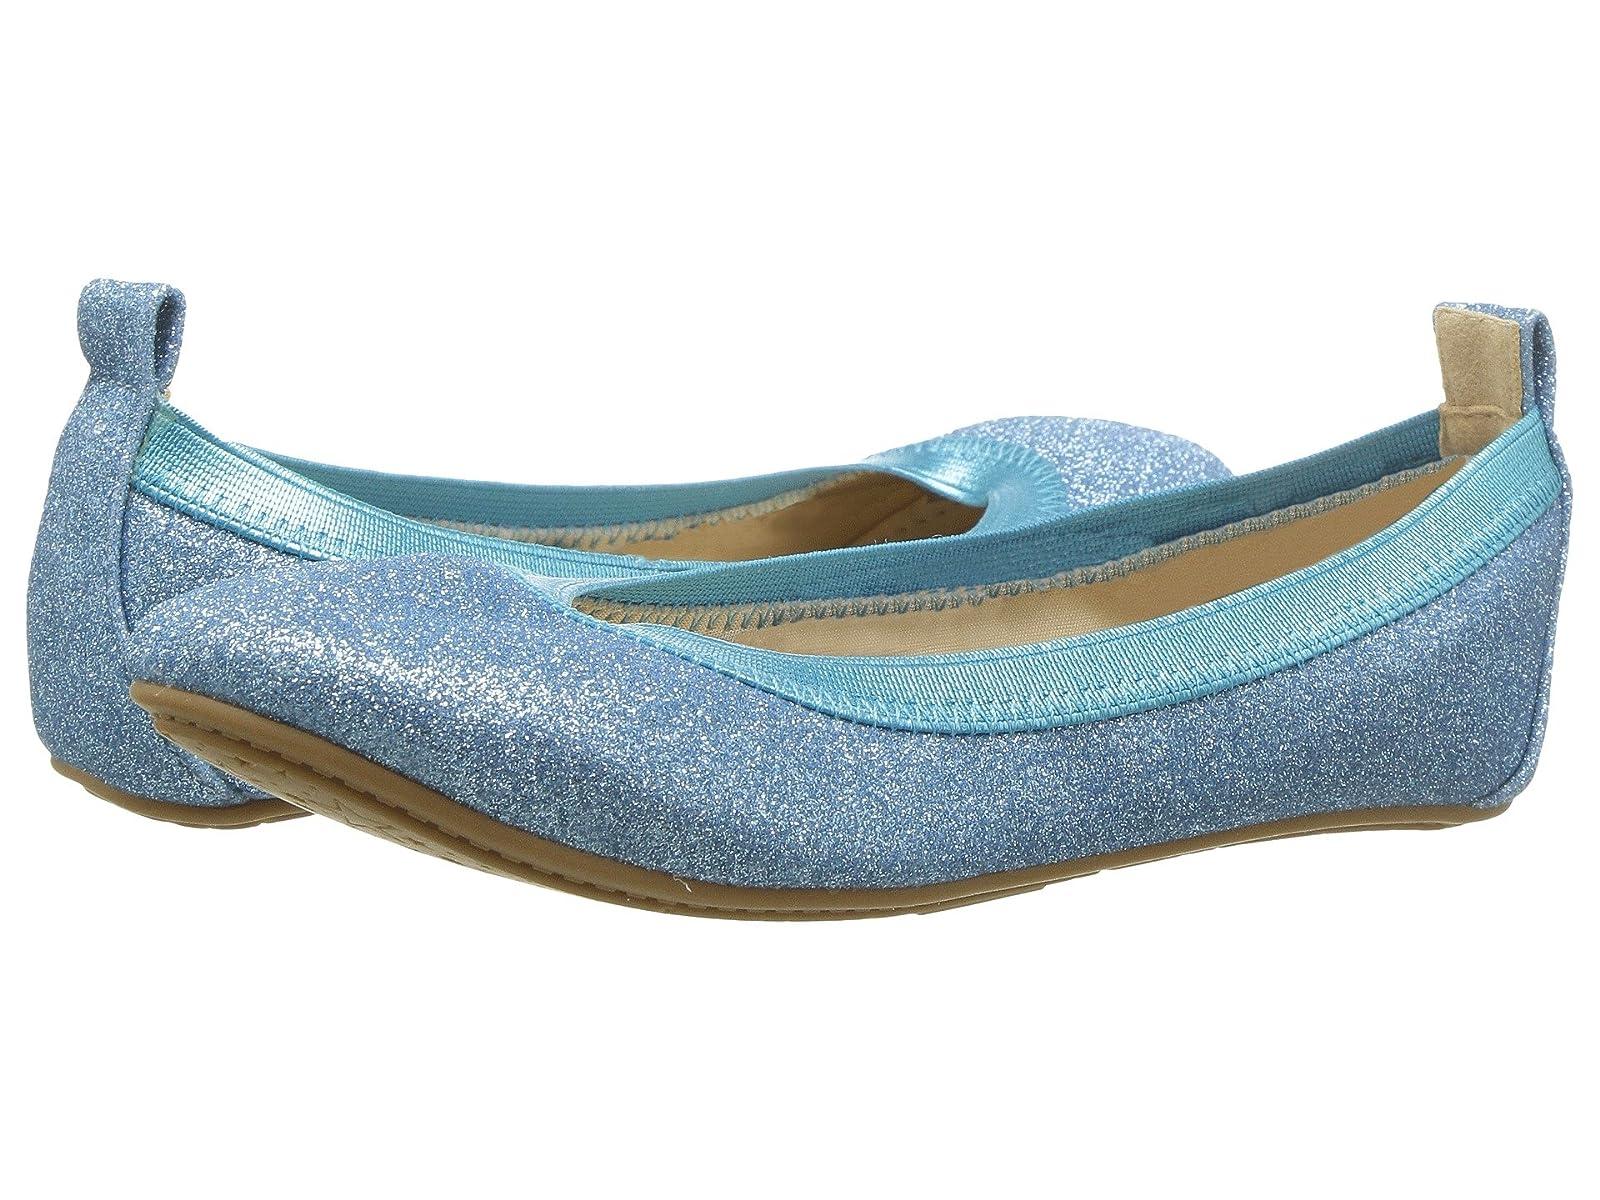 Yosi Samra Kids Miss Samara Limited Edition (Toddler/Little Kid/Big Kid)Atmospheric grades have affordable shoes